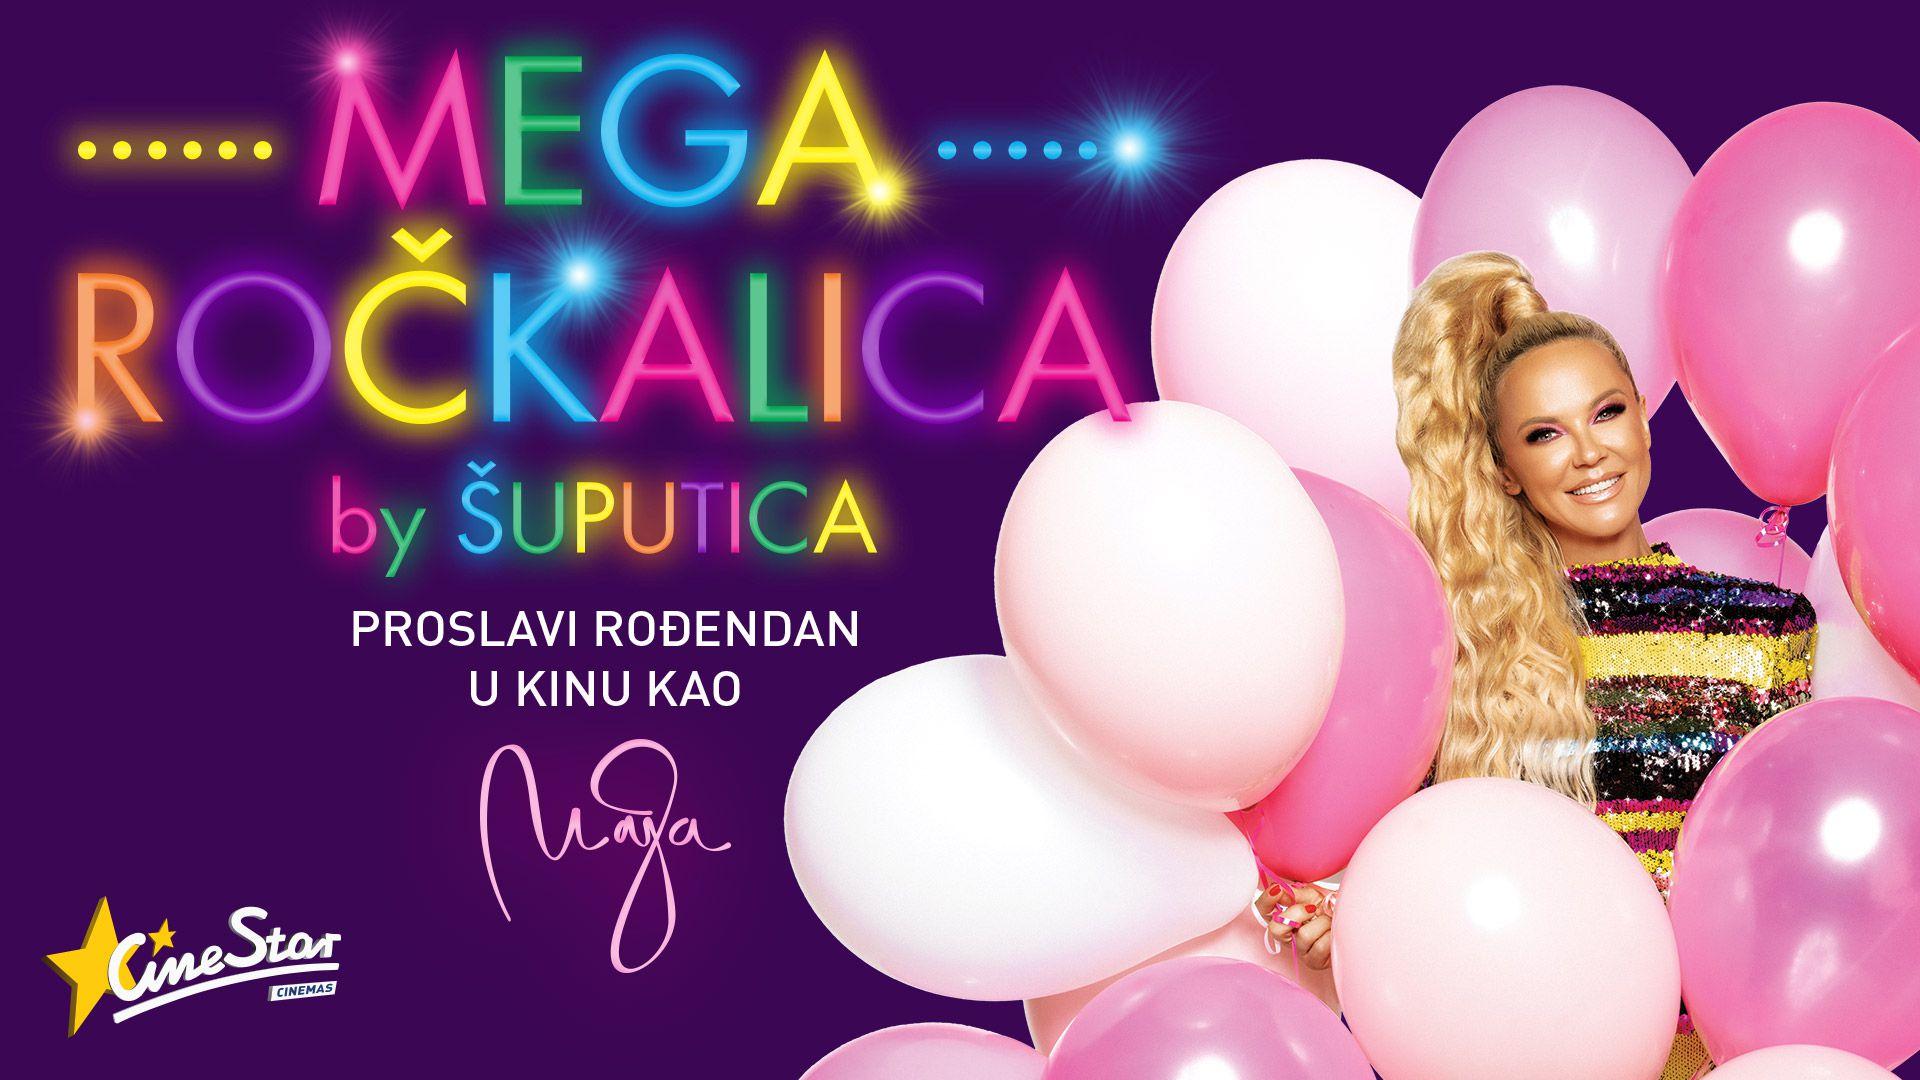 'Megaročkalica by Šuputica' - novi koncept proslave dječjih rođendana u Cinestar kinima